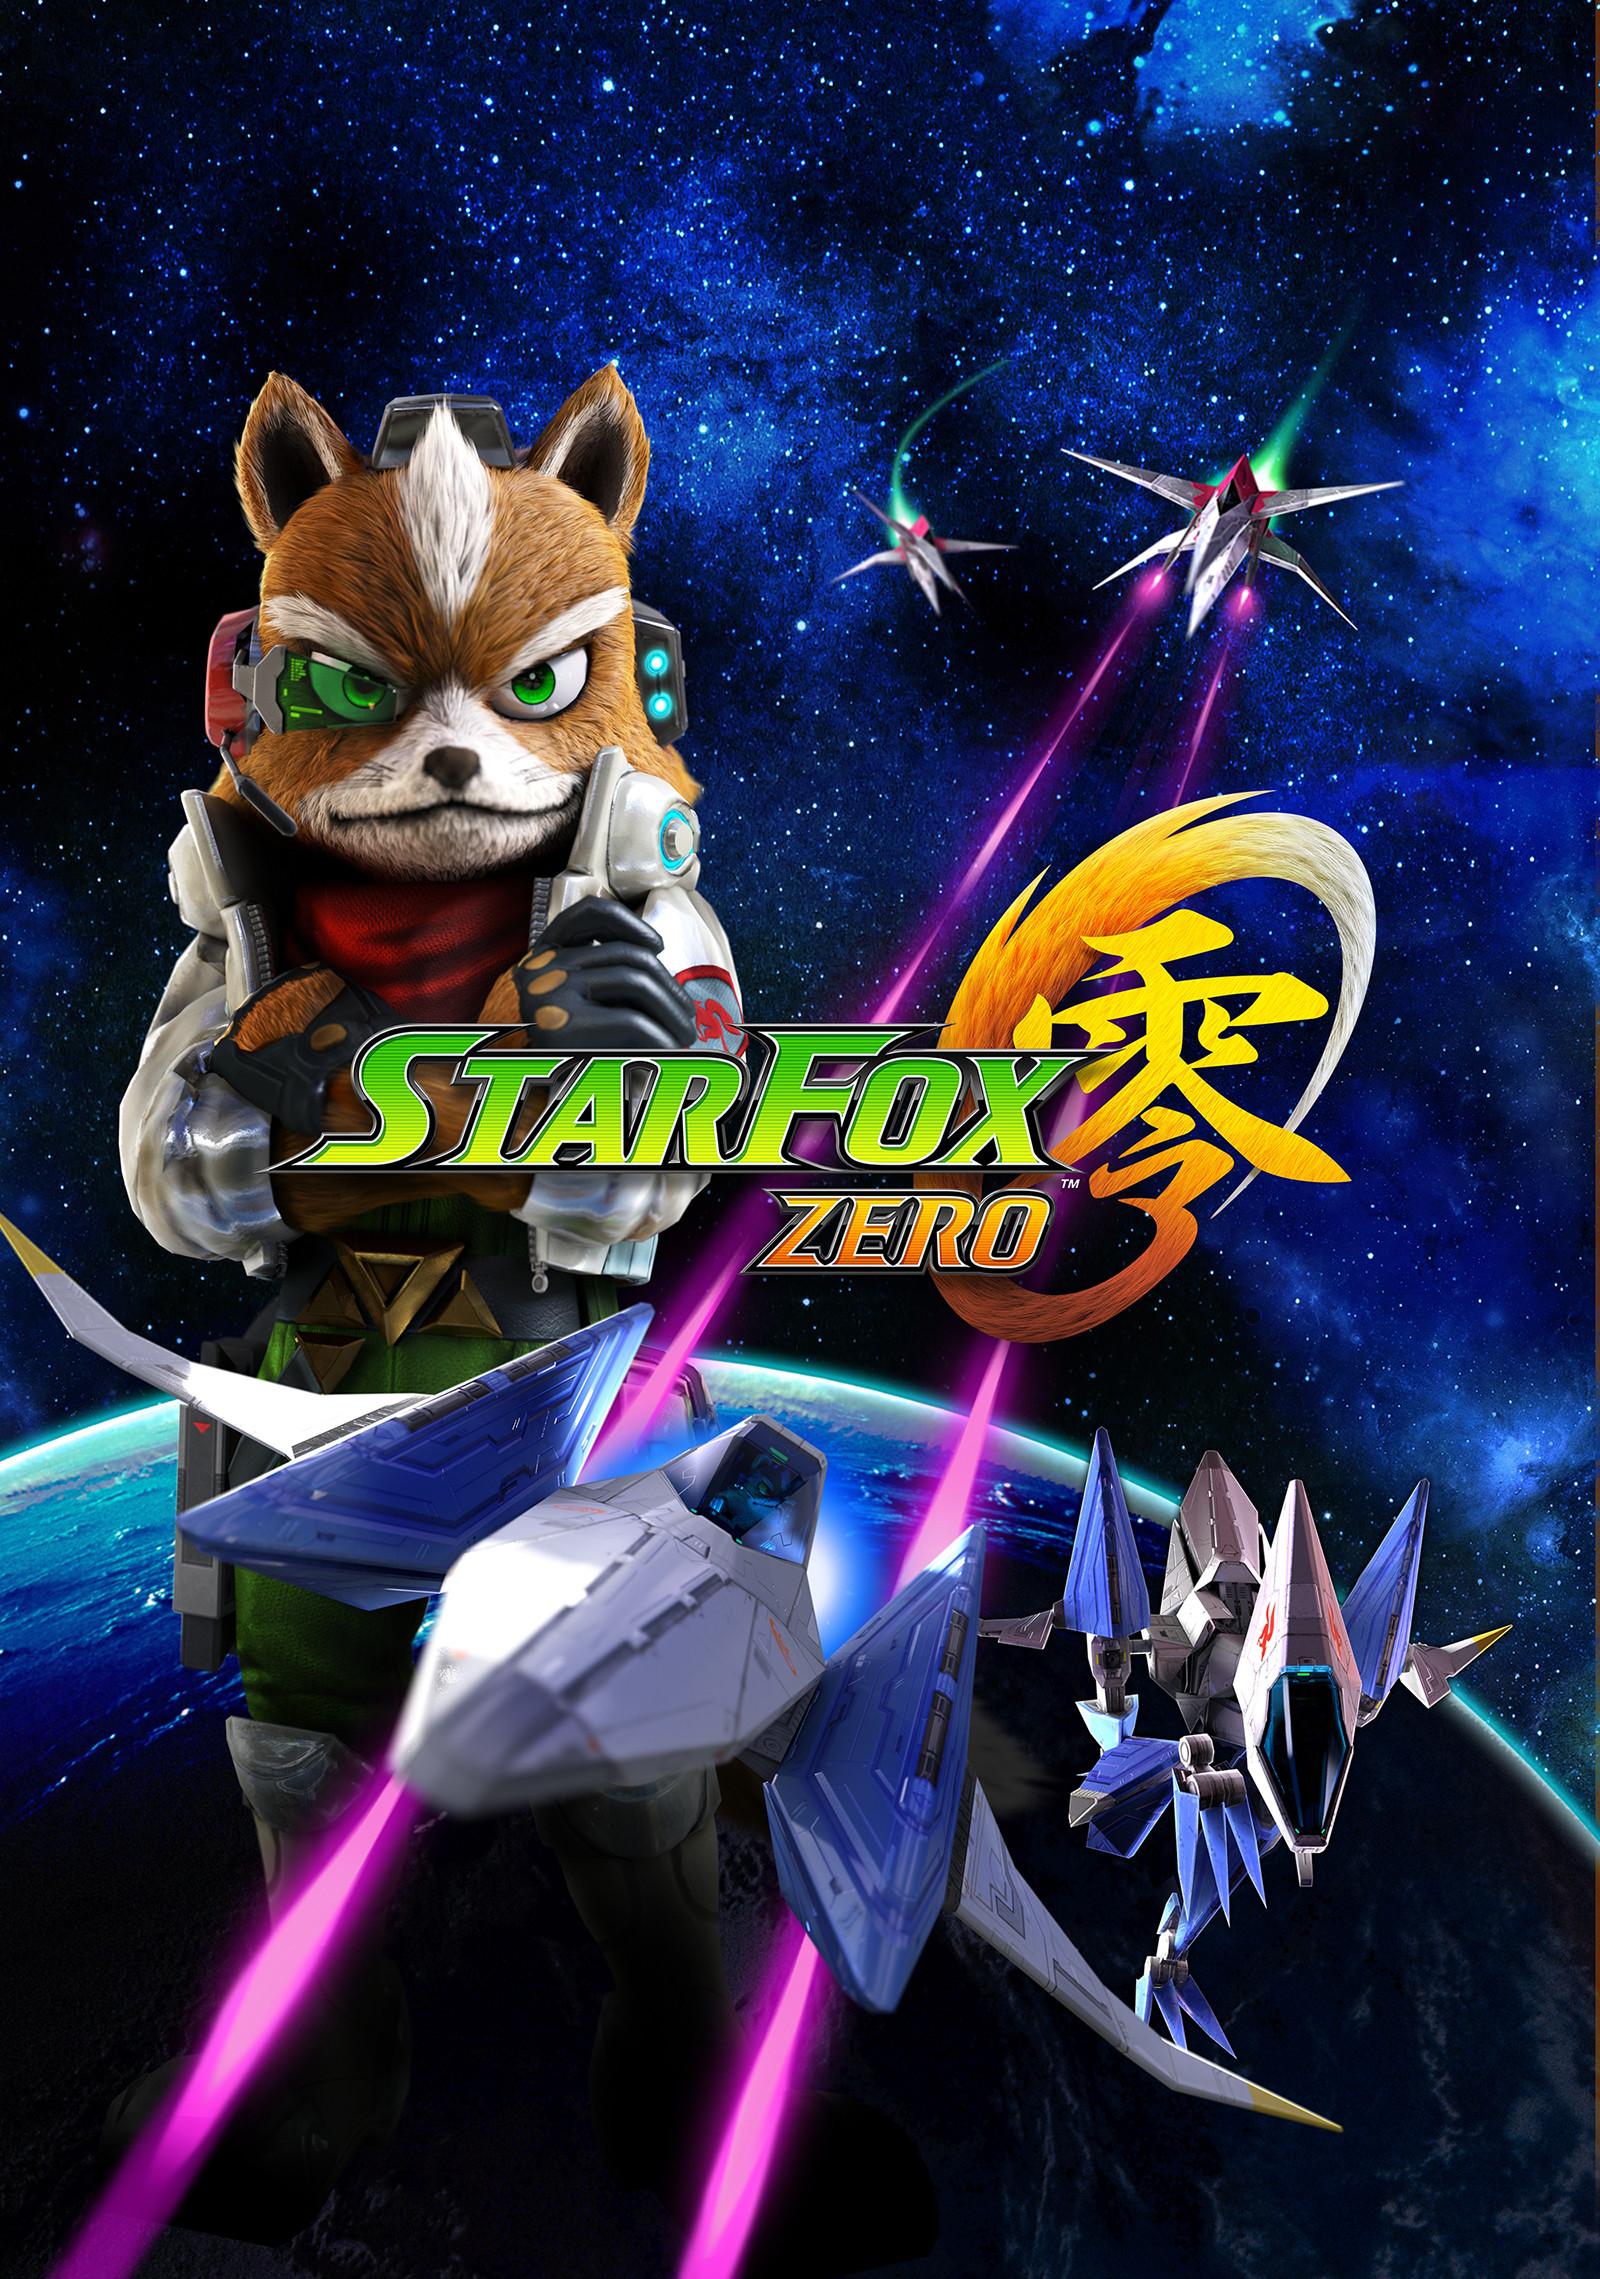 Star Fox Zero Official Artwork With Logo Nintendo Wii U